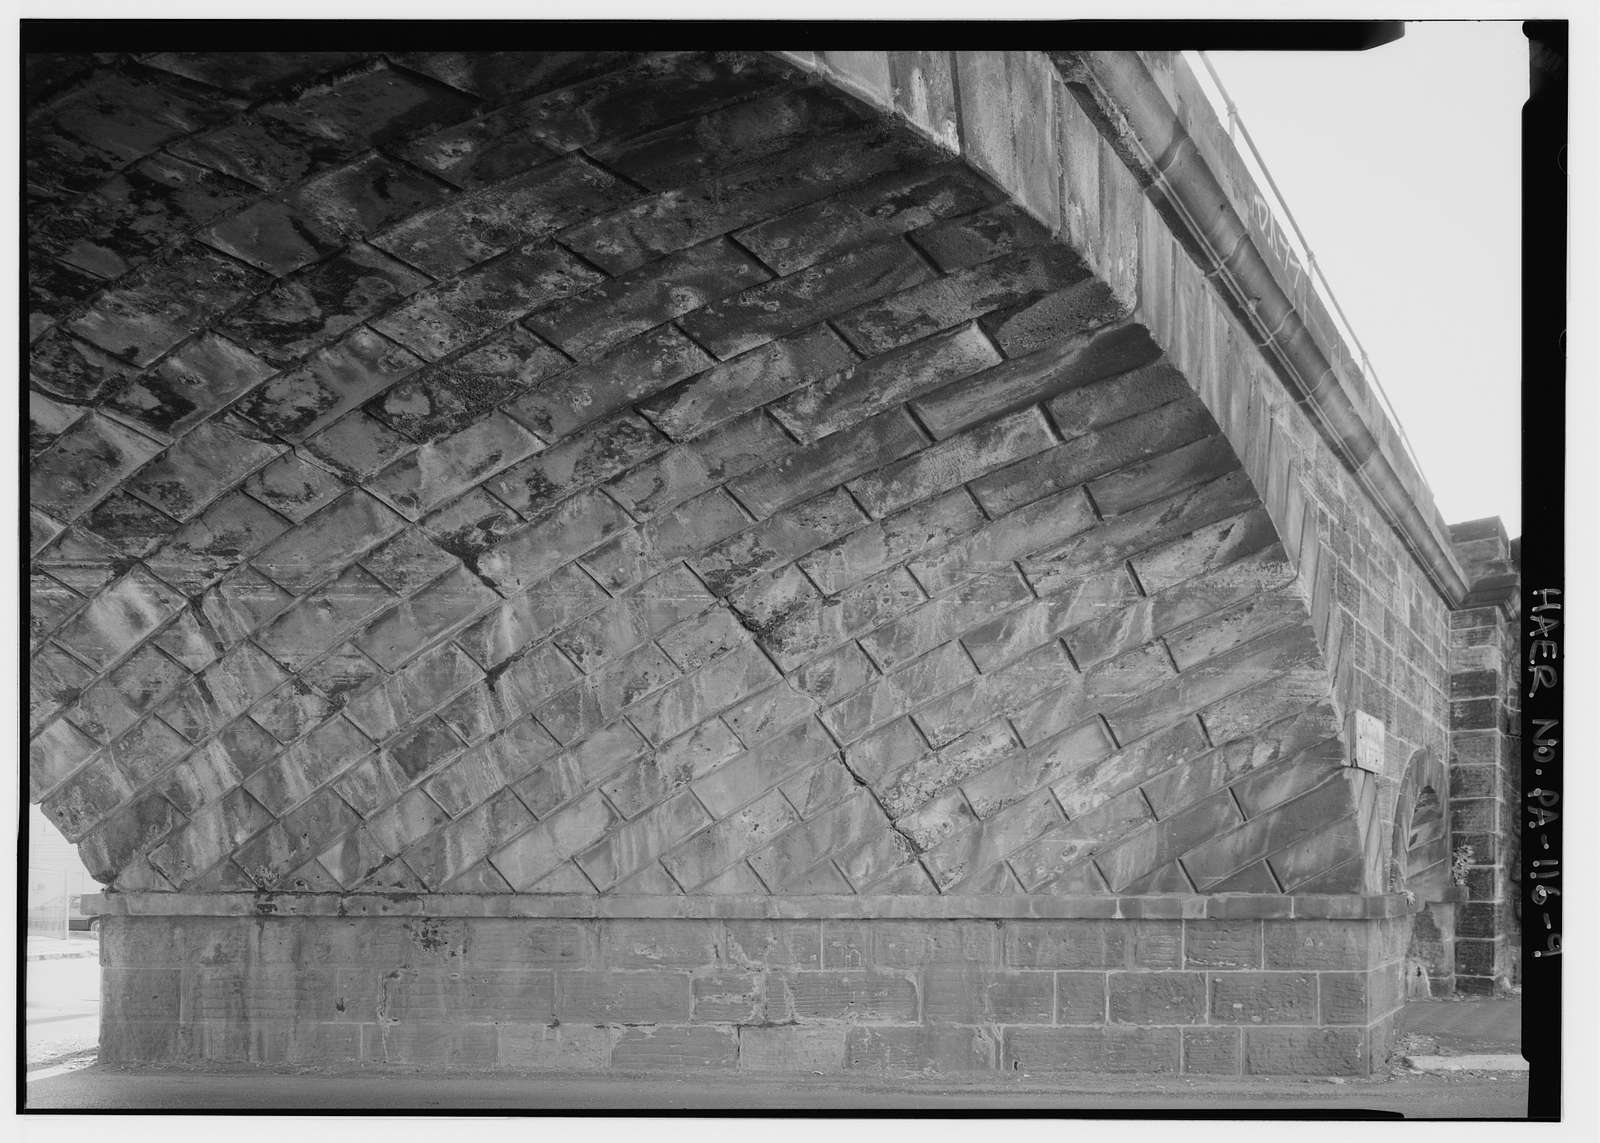 Philadelphia & Reading Railroad, Skew Arch Bridge, North Sixth Street at Woodward Street, Reading, Berks County, PA